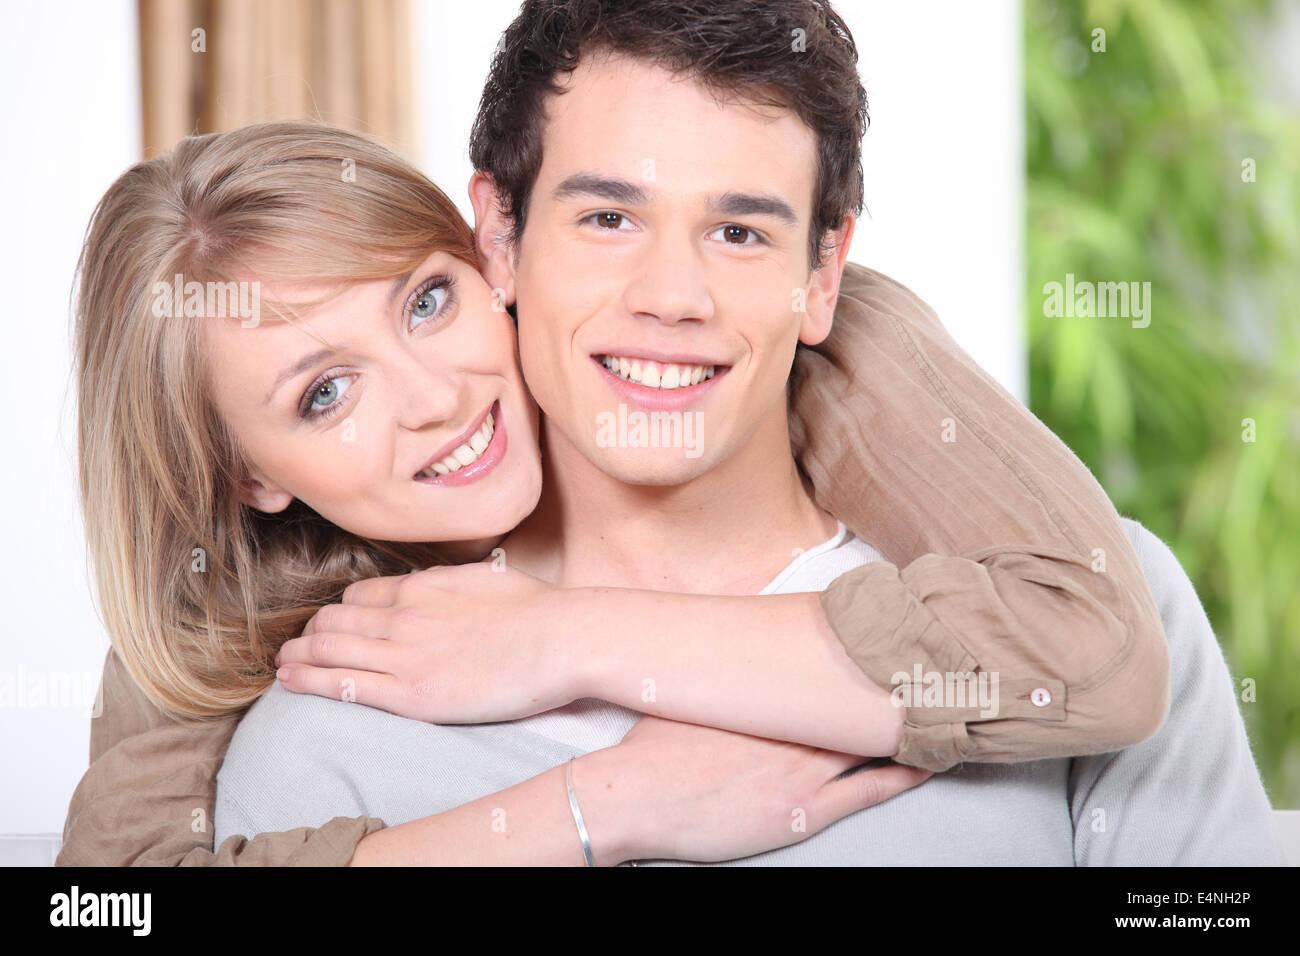 Woman embracing her boyfriend - Stock Image